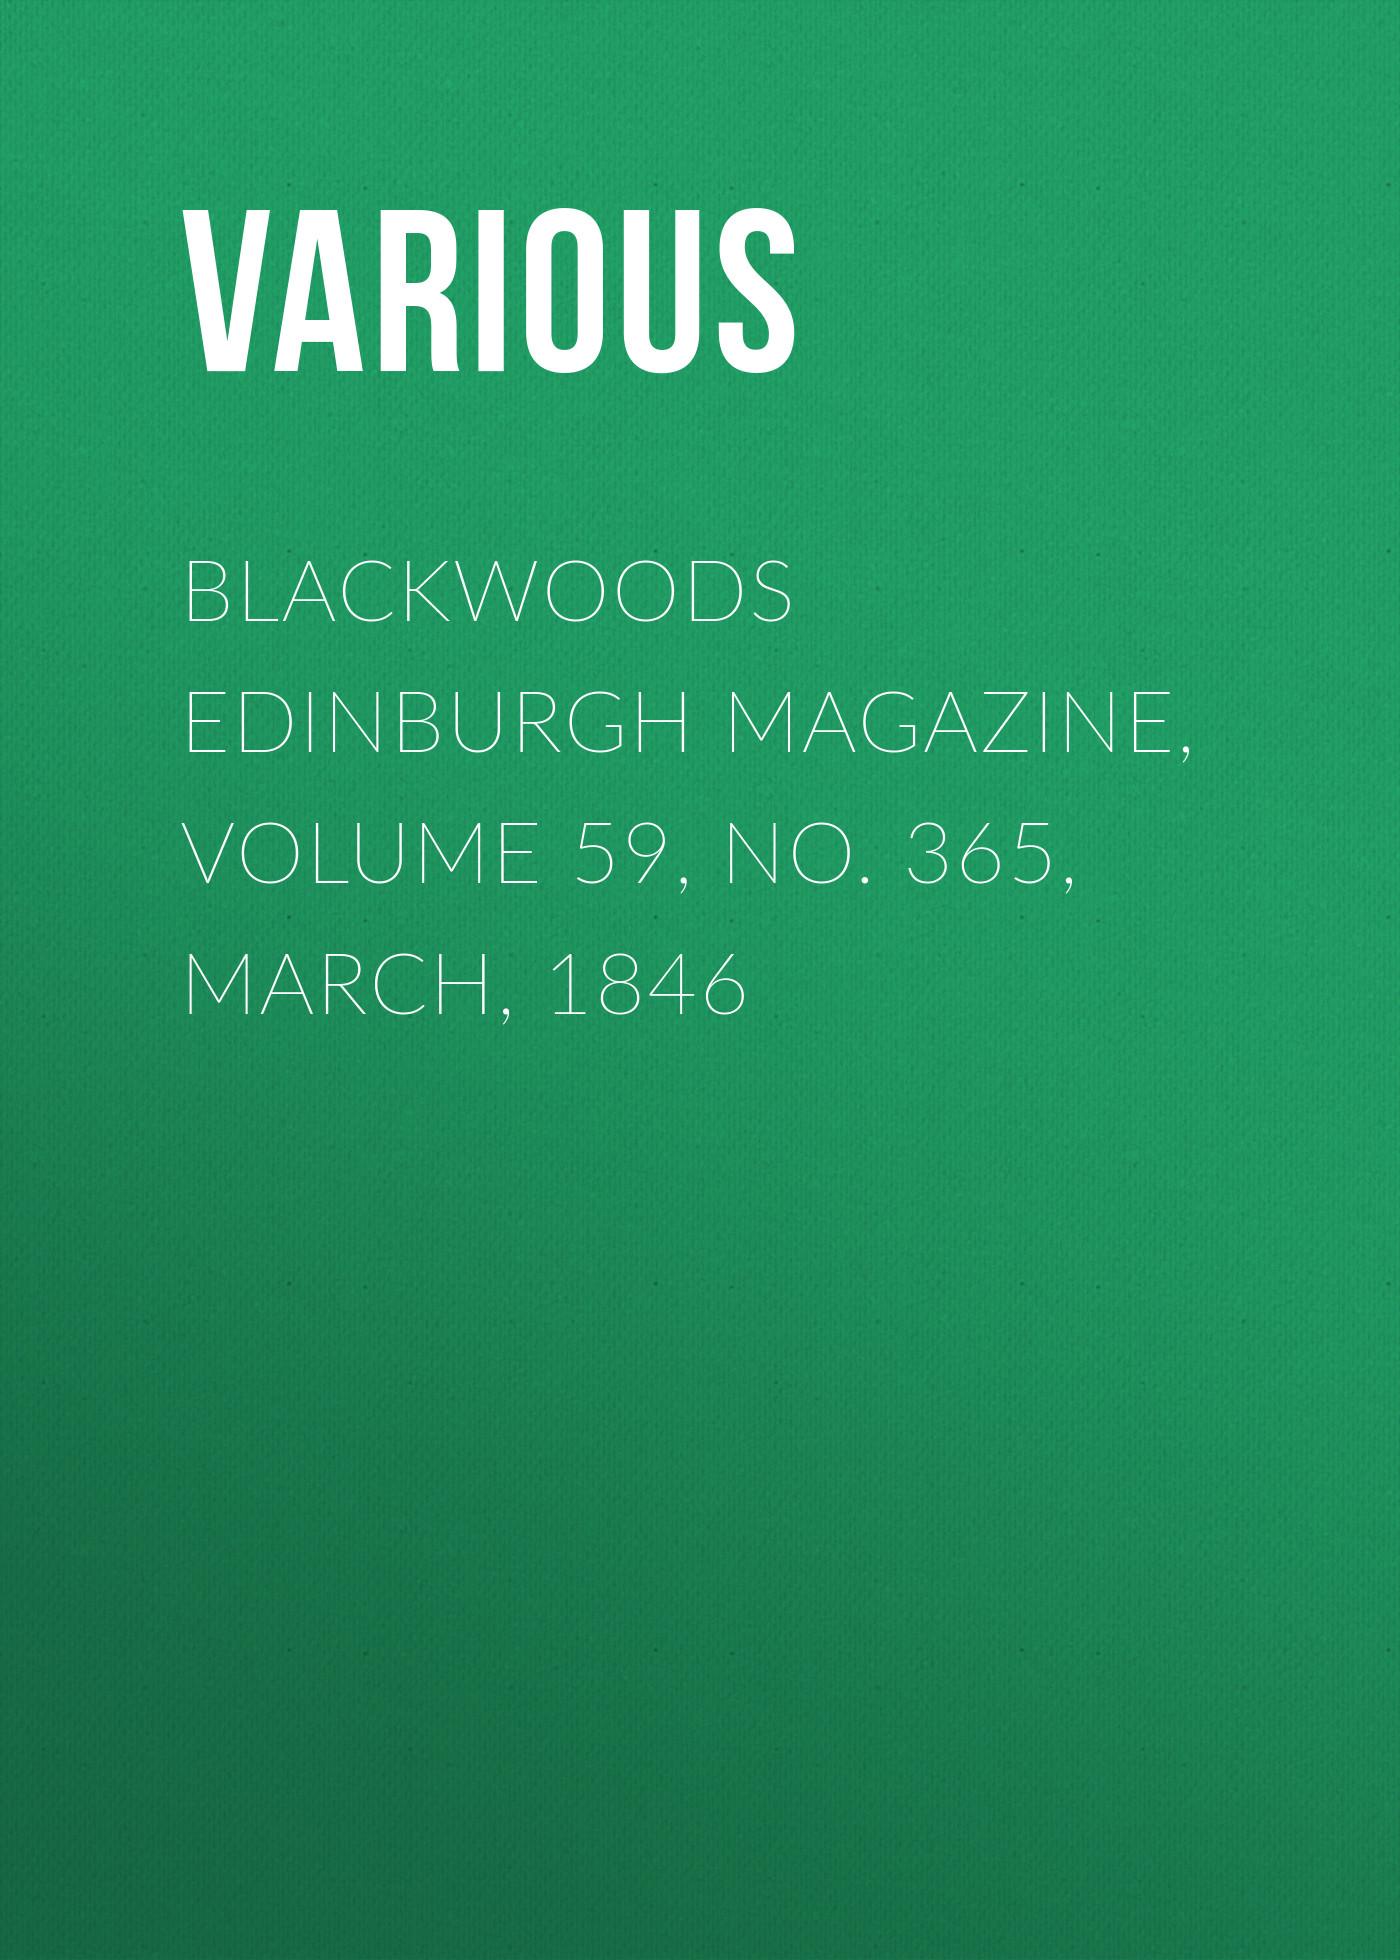 Various Blackwoods Edinburgh Magazine, Volume 59, No. 365, March, 1846 rachael ray 365 no repeats